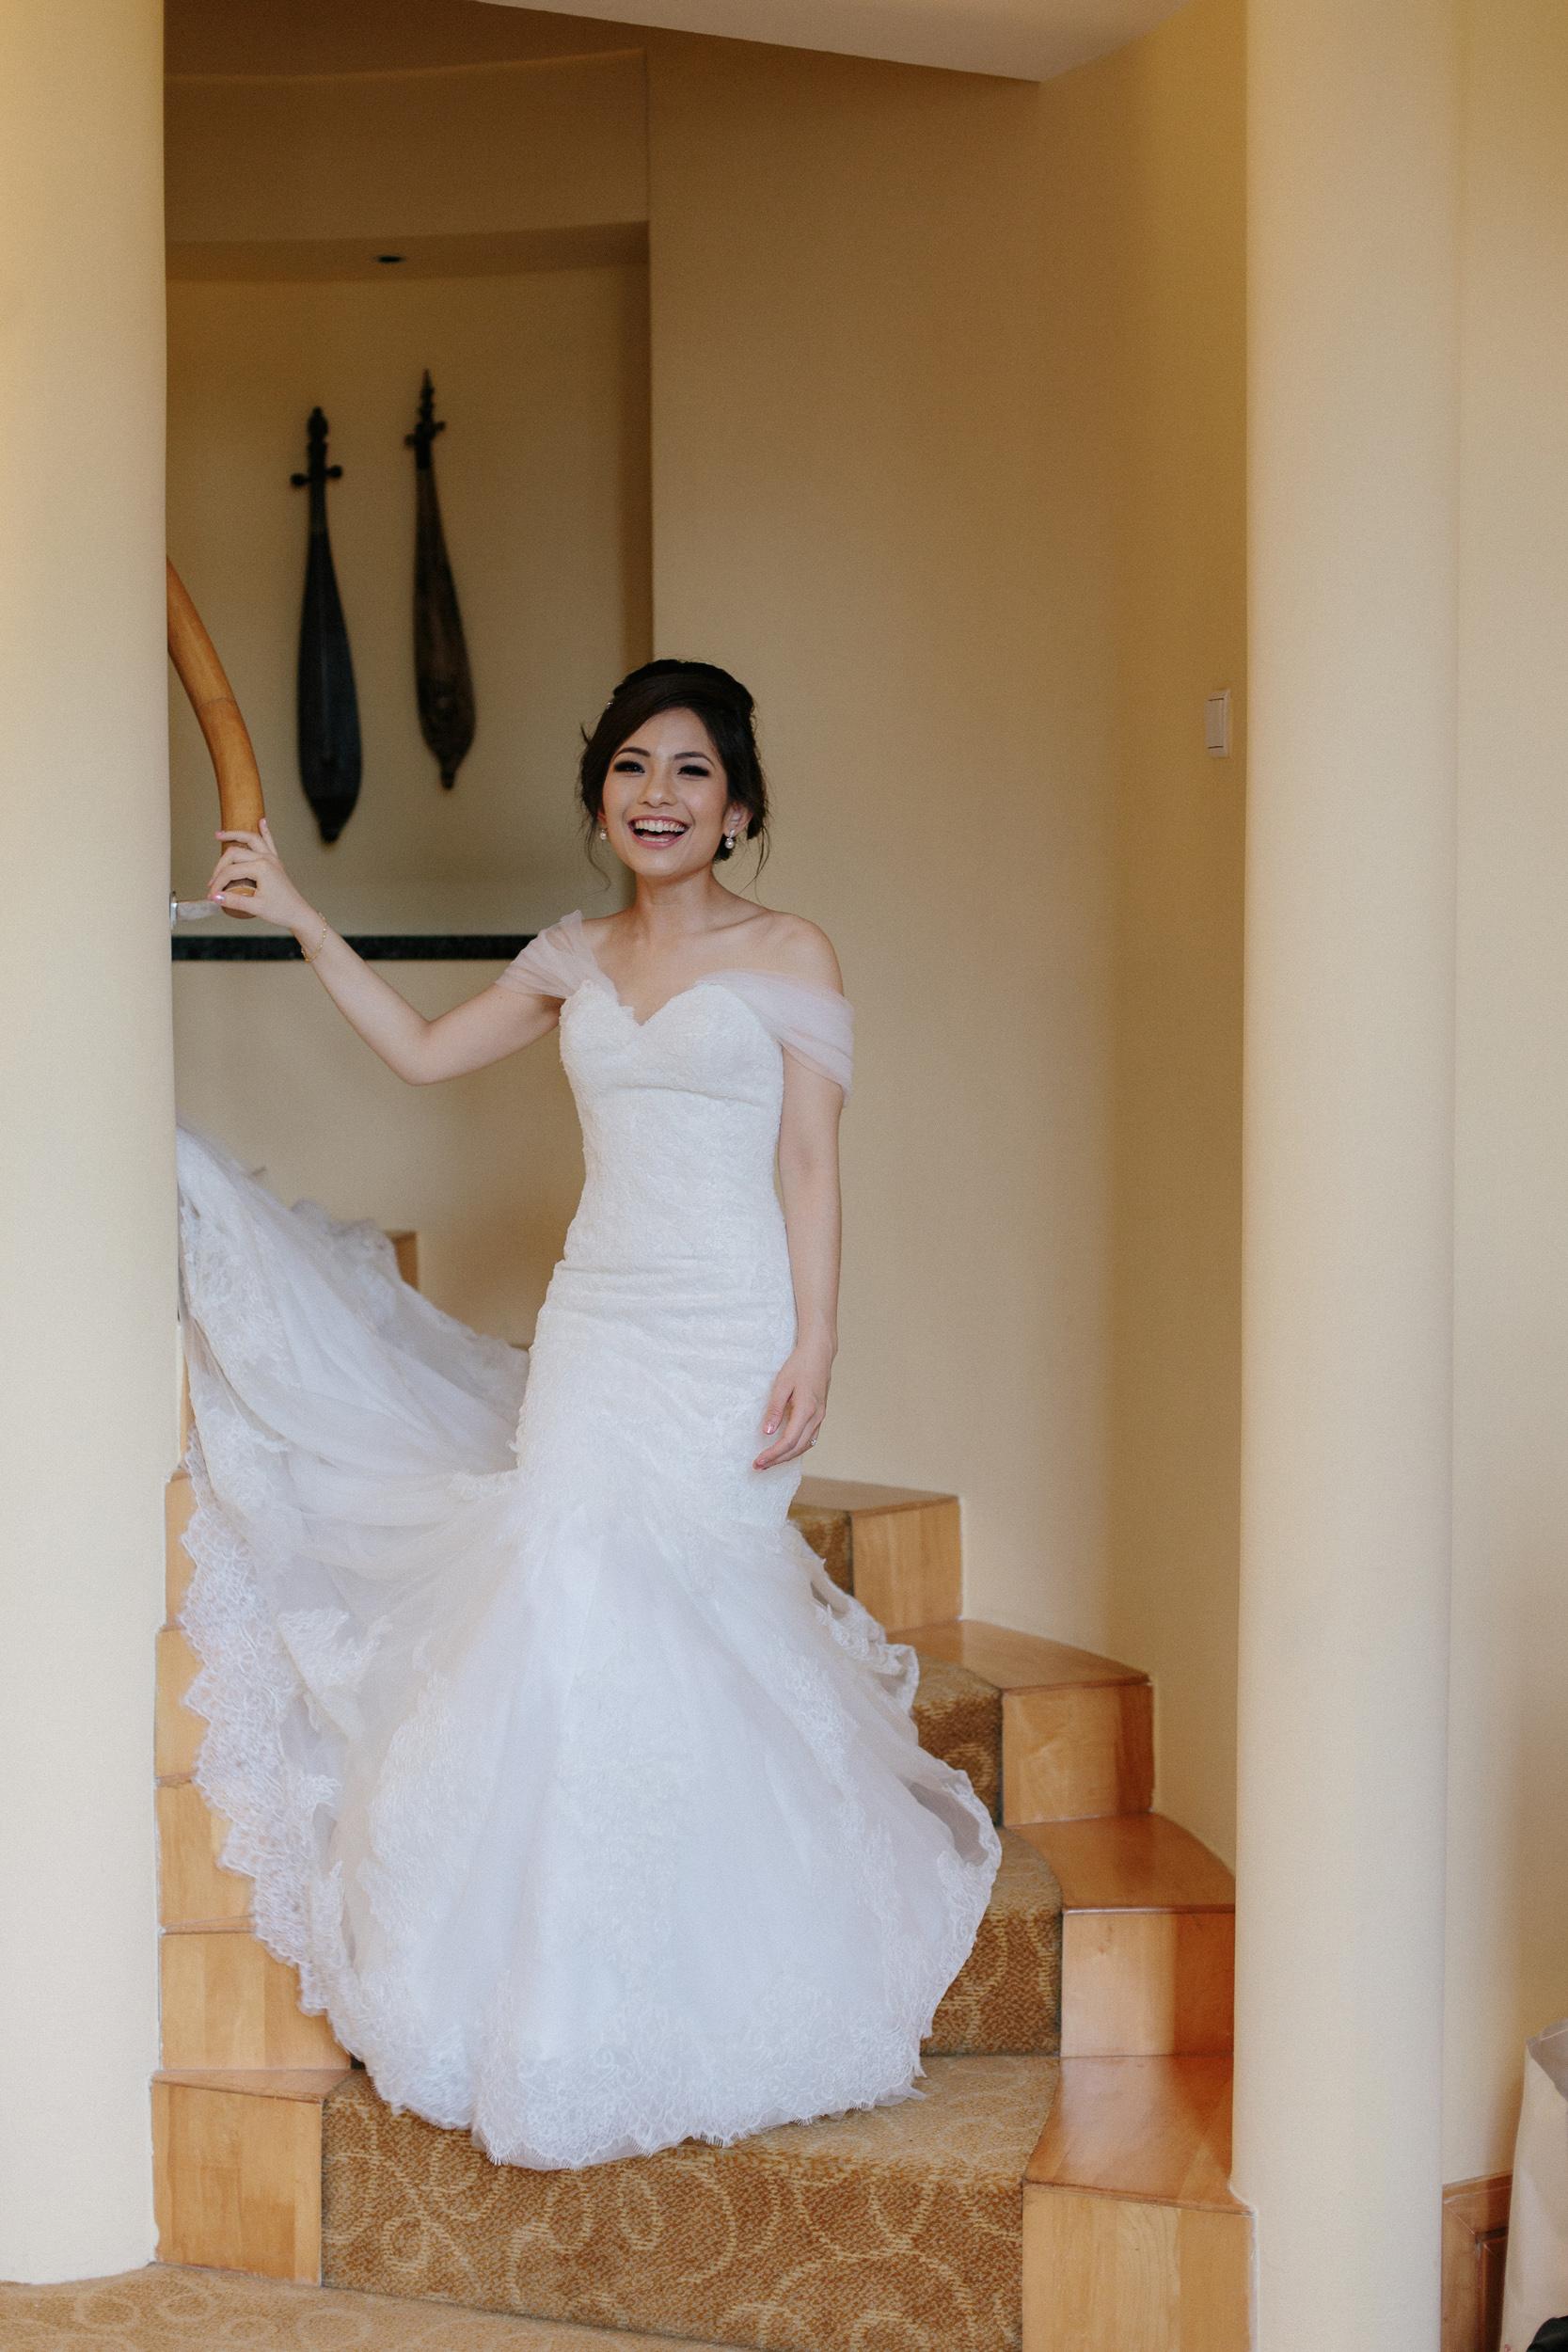 singapore-wedding-photographer-cheryl-matthew-fullerton-hotel-wedding-38.jpg